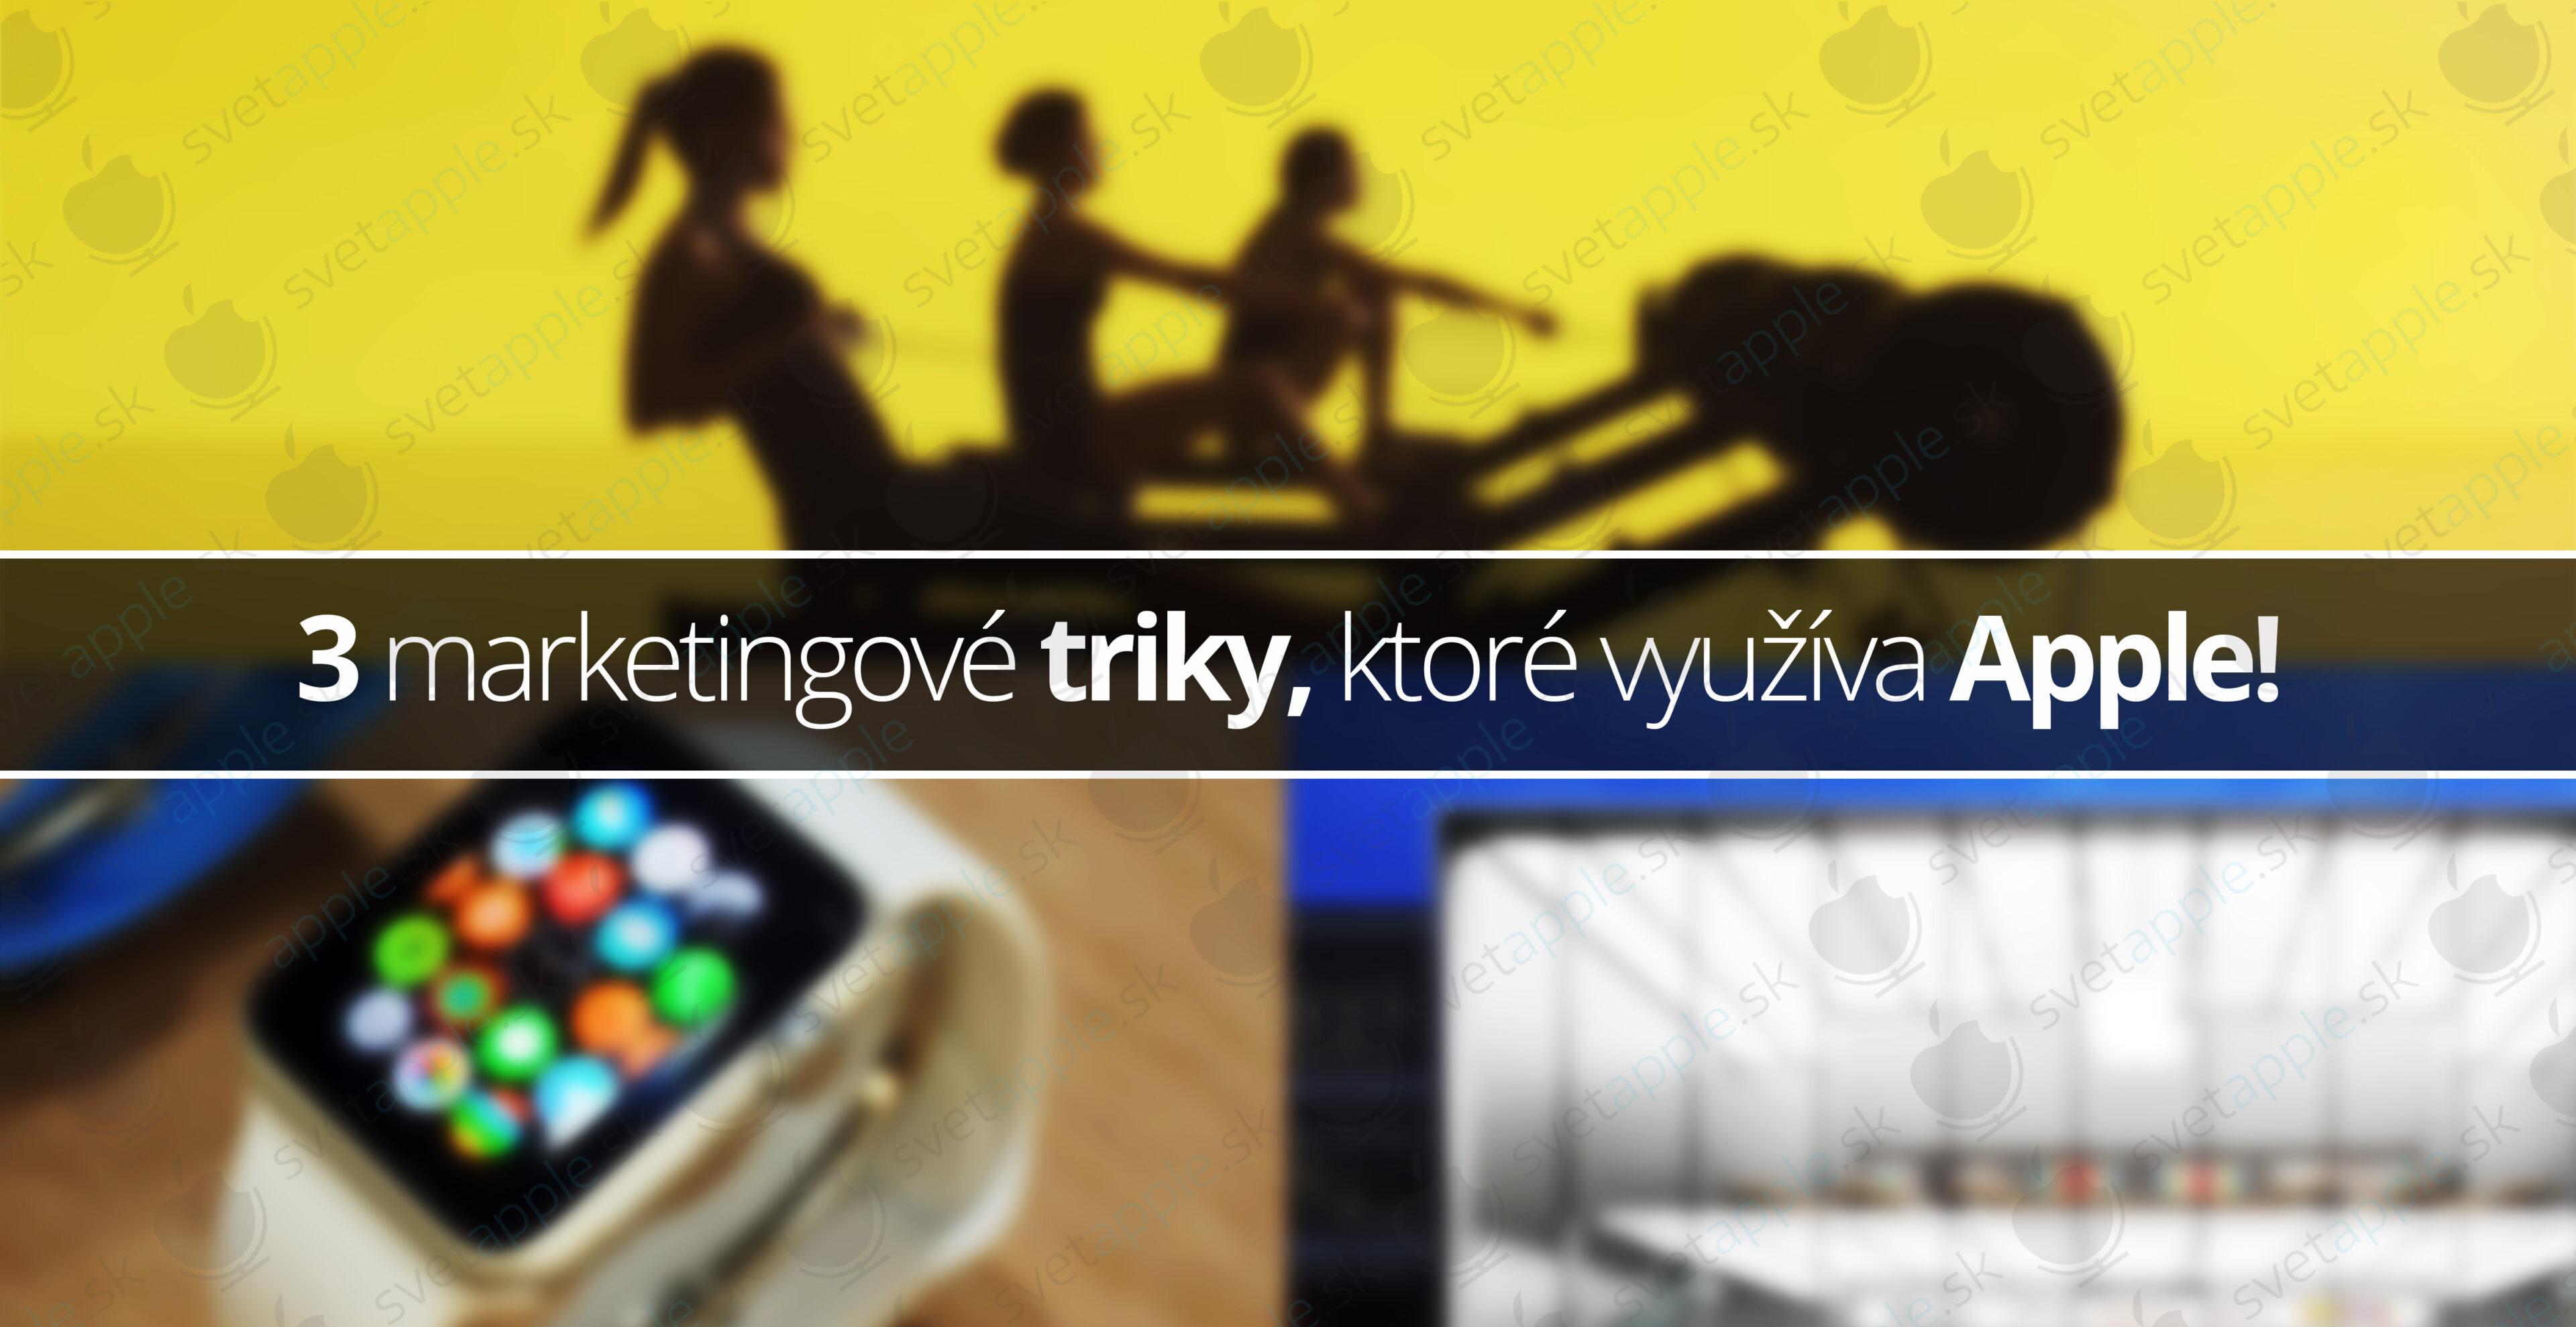 marketingove-triky-apple---titulná-fotografia---SvetApple